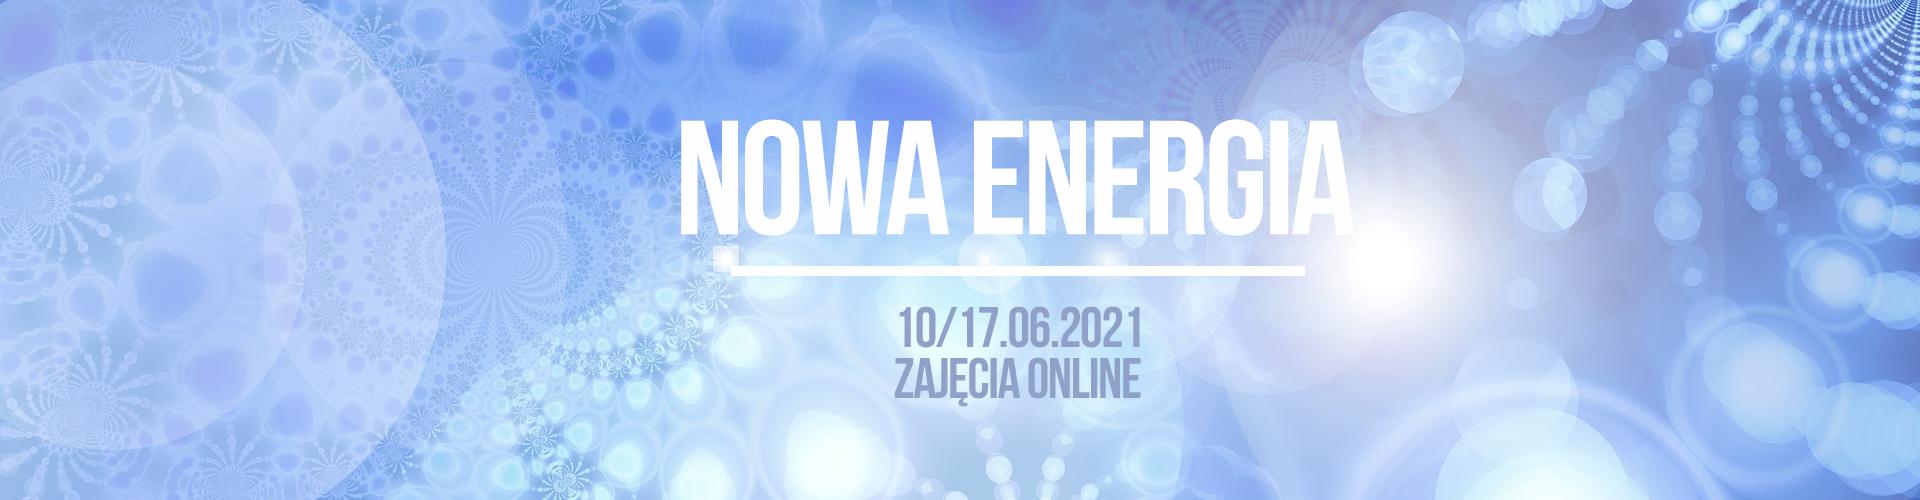 NOWA-ENERGIA